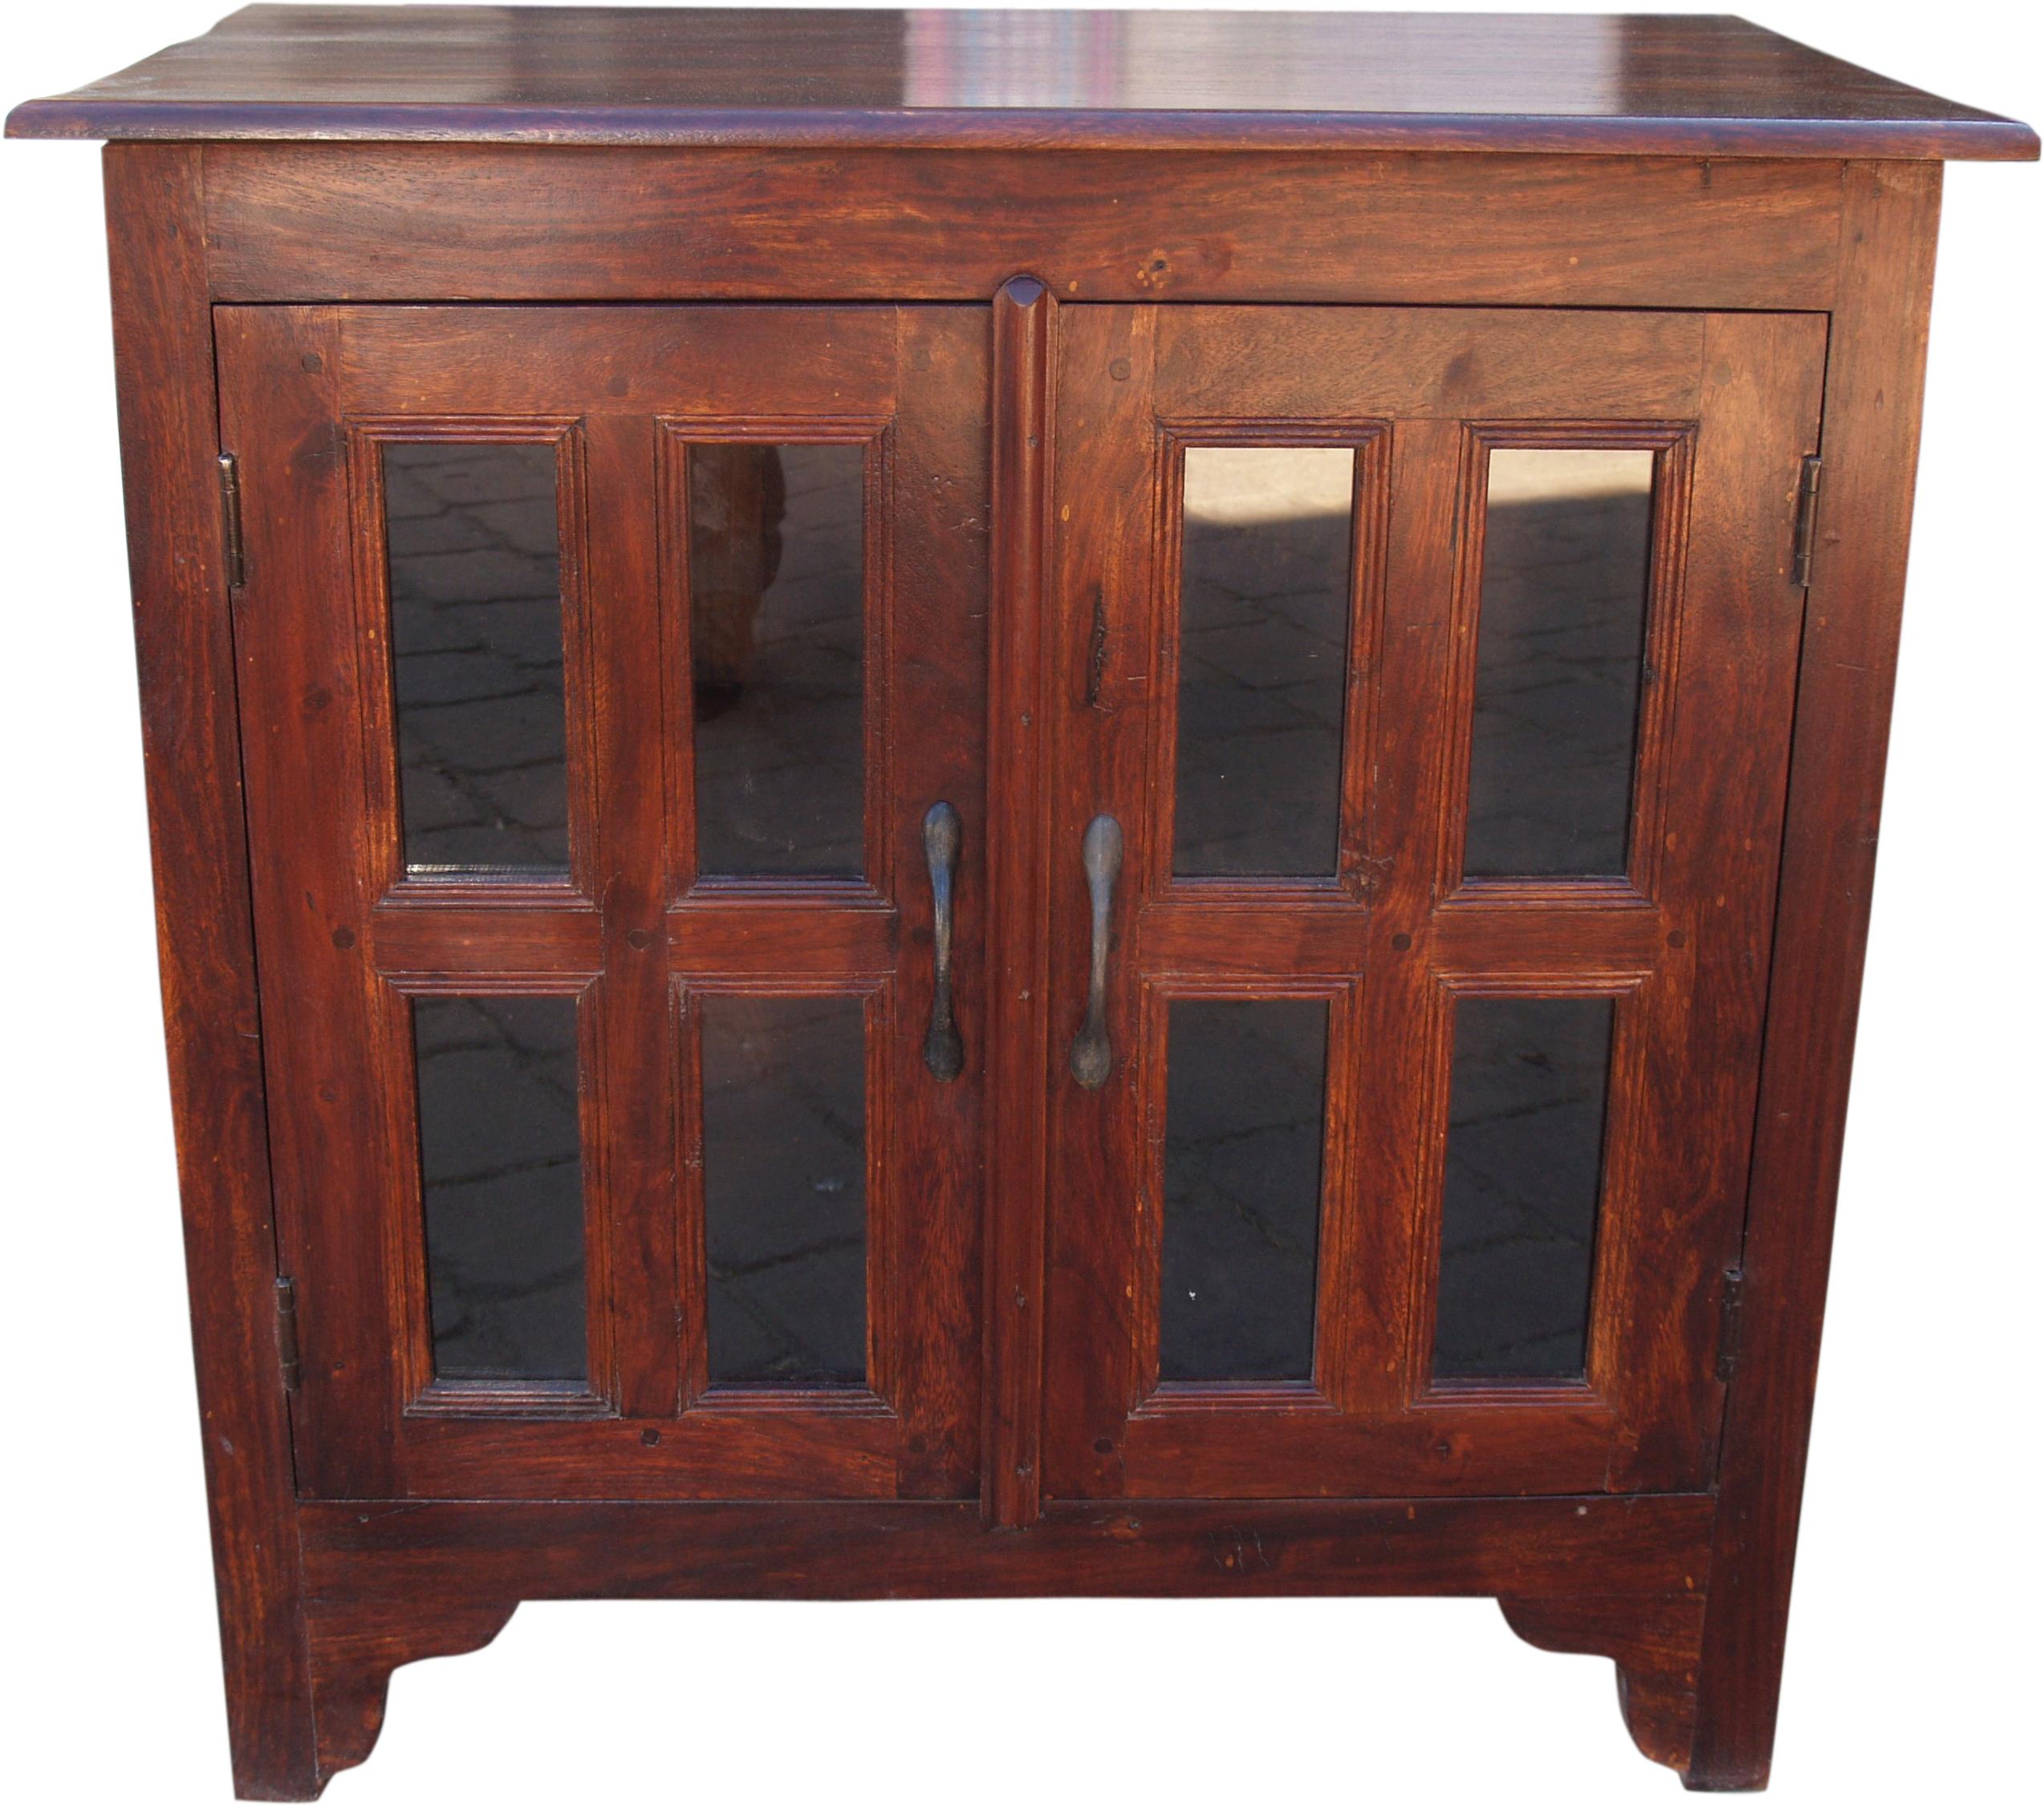 kolonialstil kommodenschr nkchen mit glast r. Black Bedroom Furniture Sets. Home Design Ideas